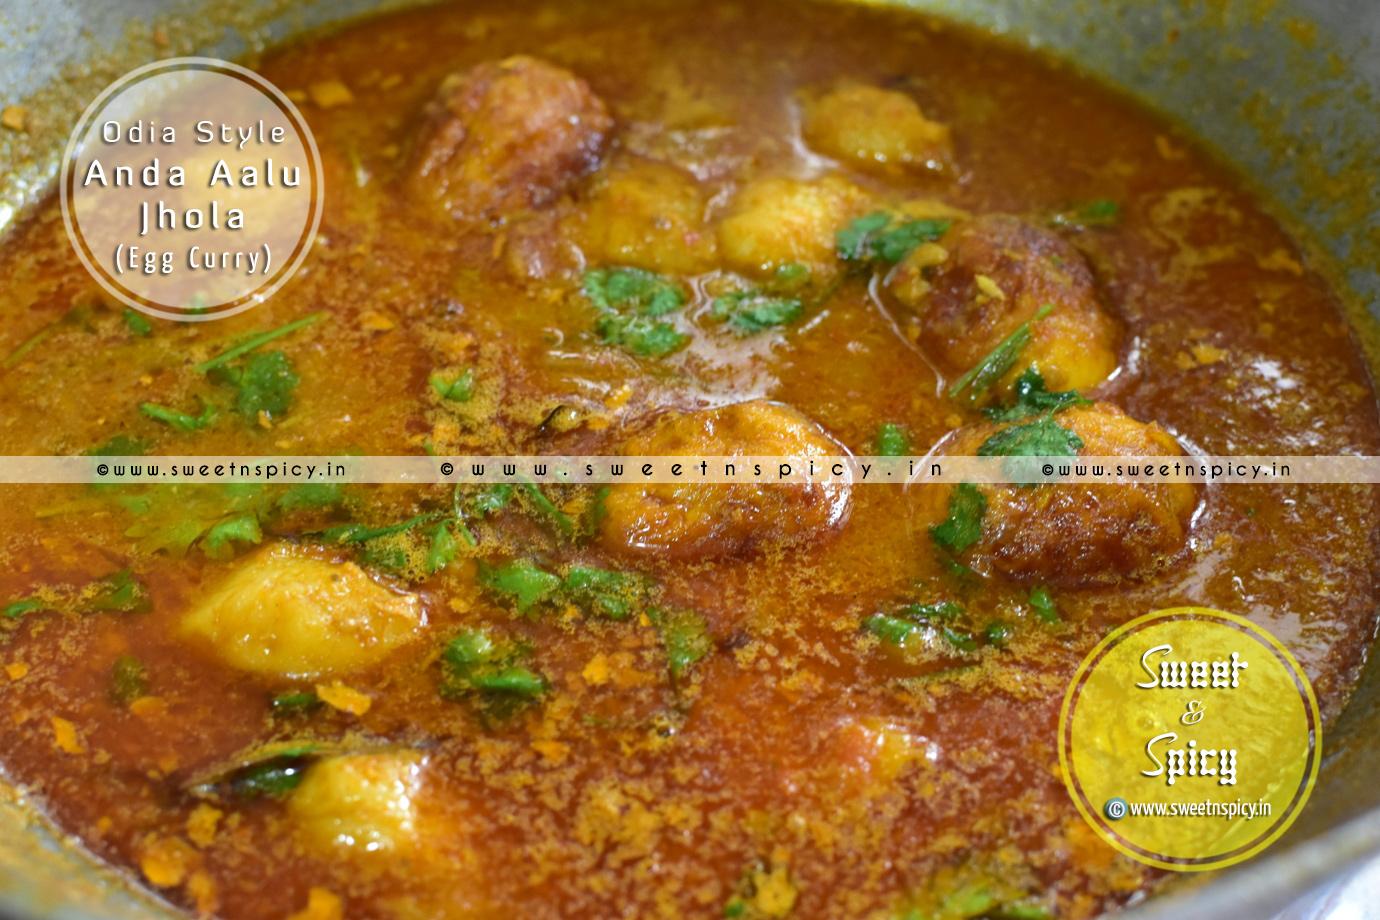 Anda Aalu Jhola (Odia Style Egg Curry)